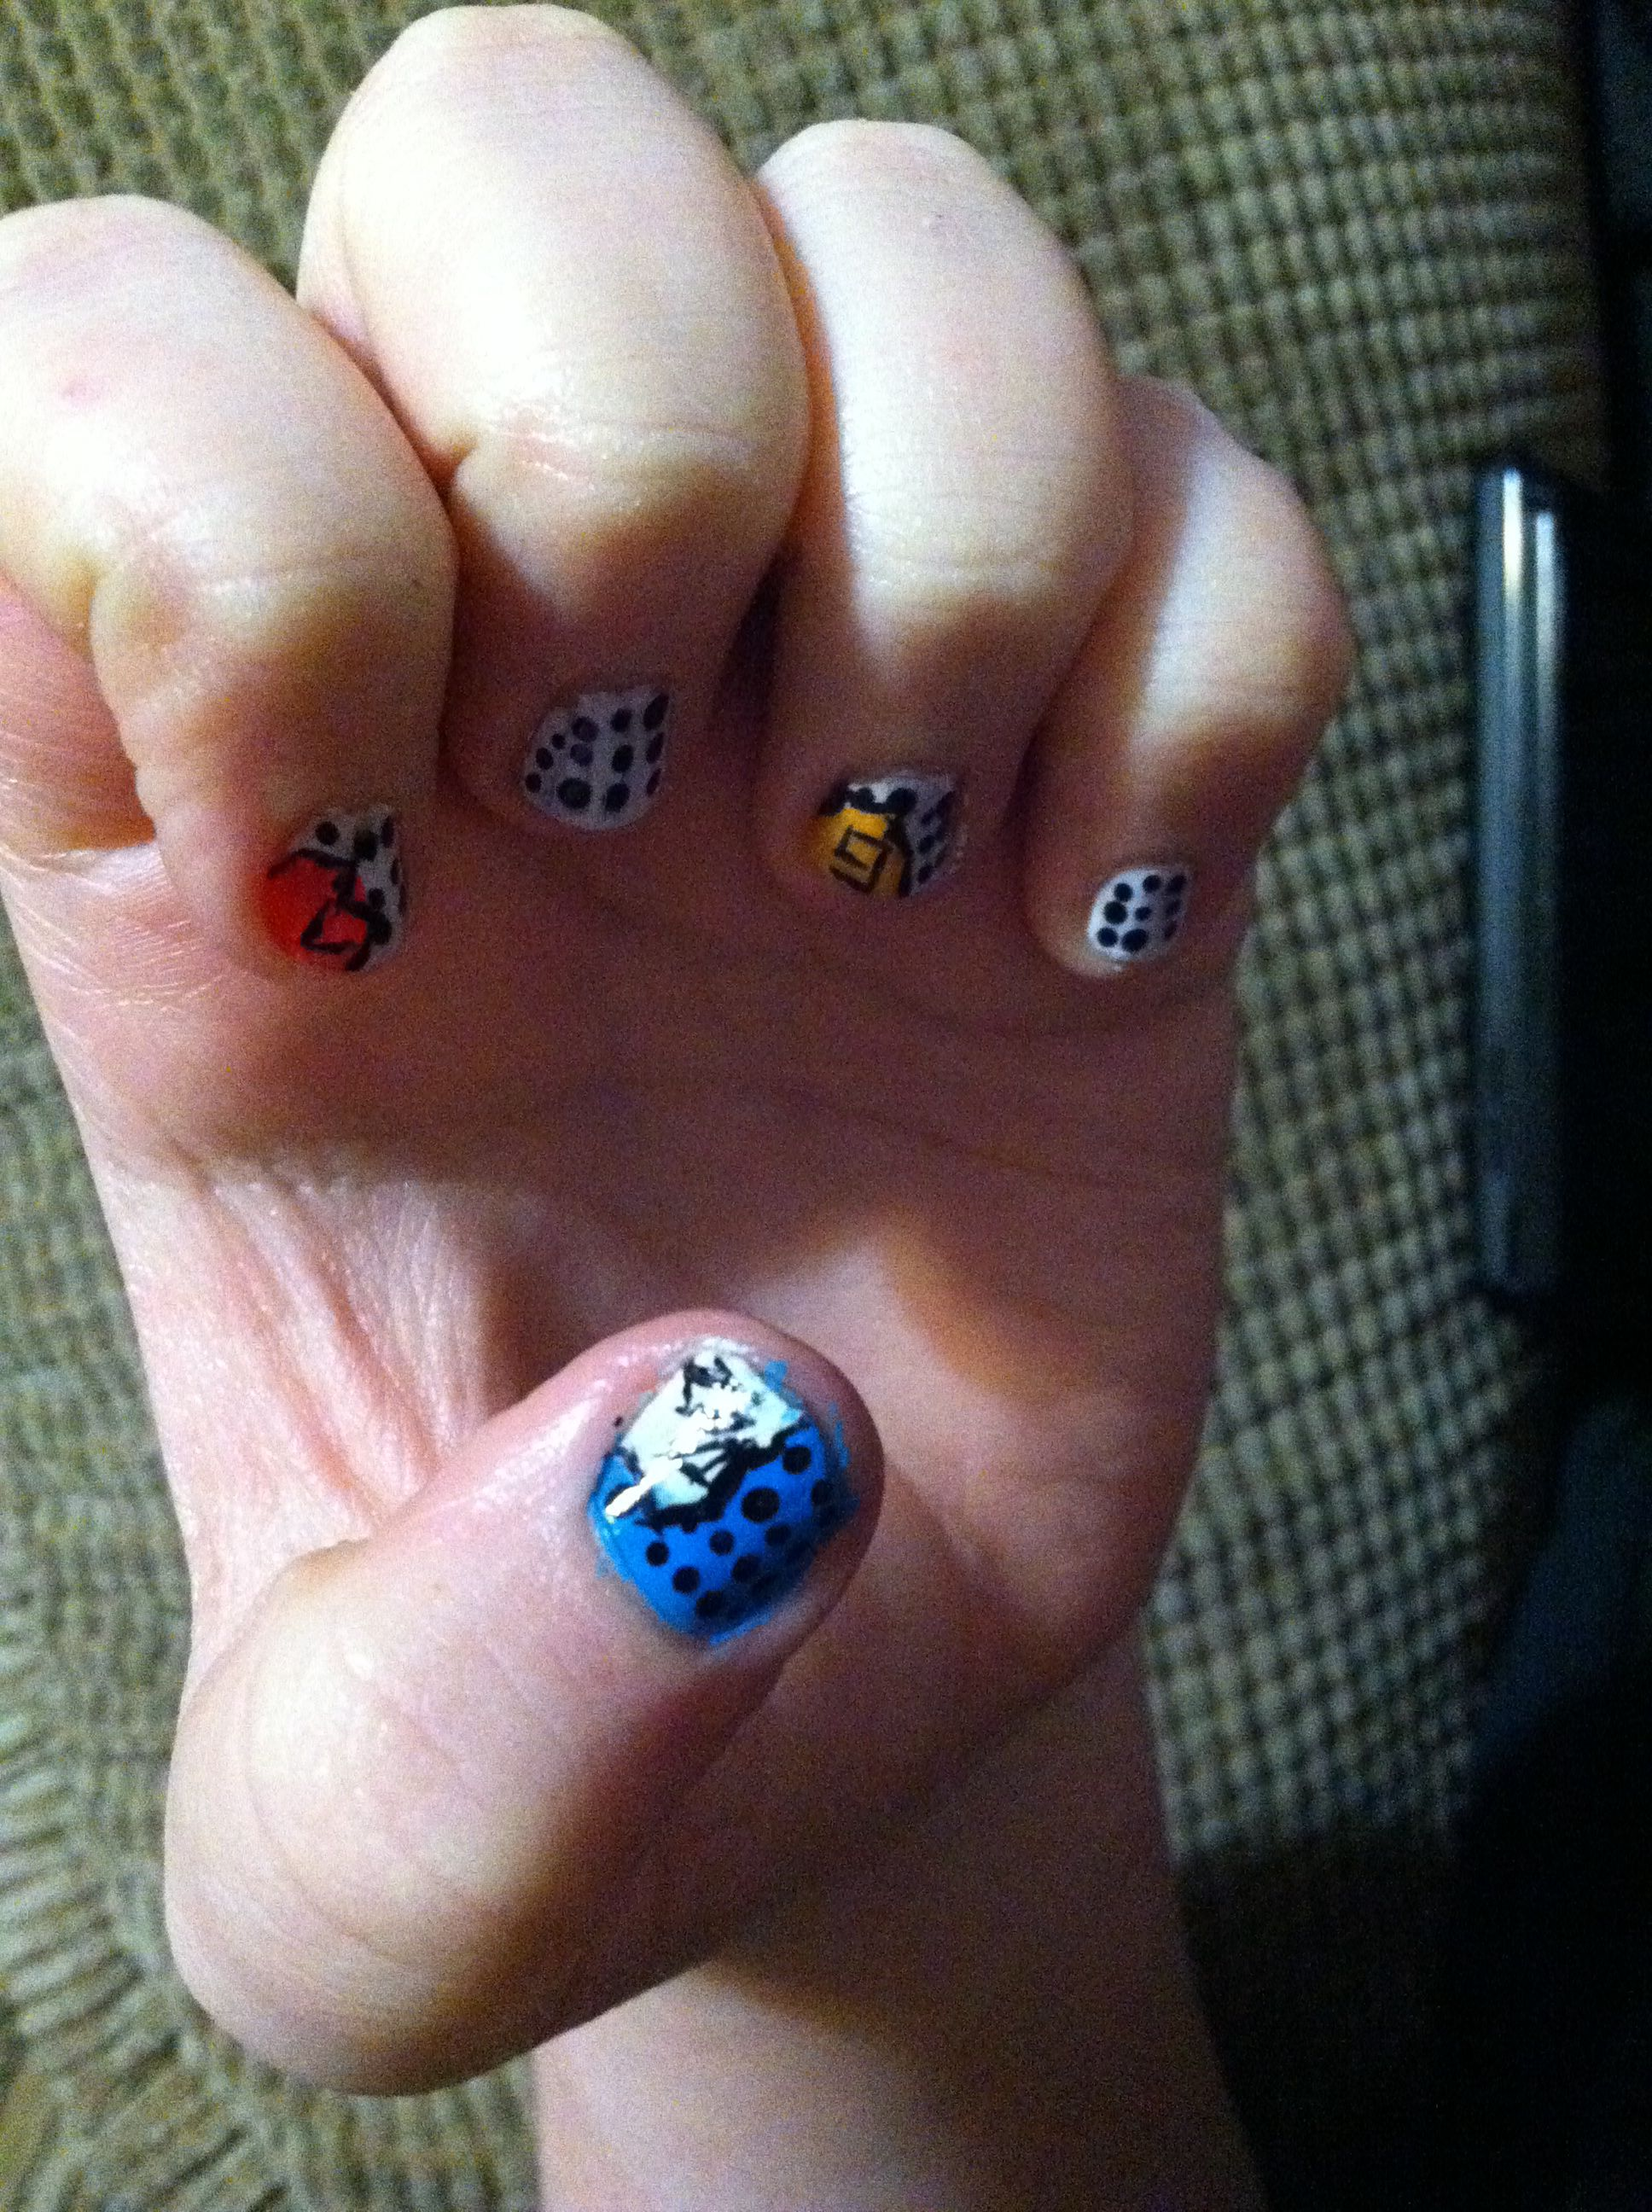 Her nails where a little short